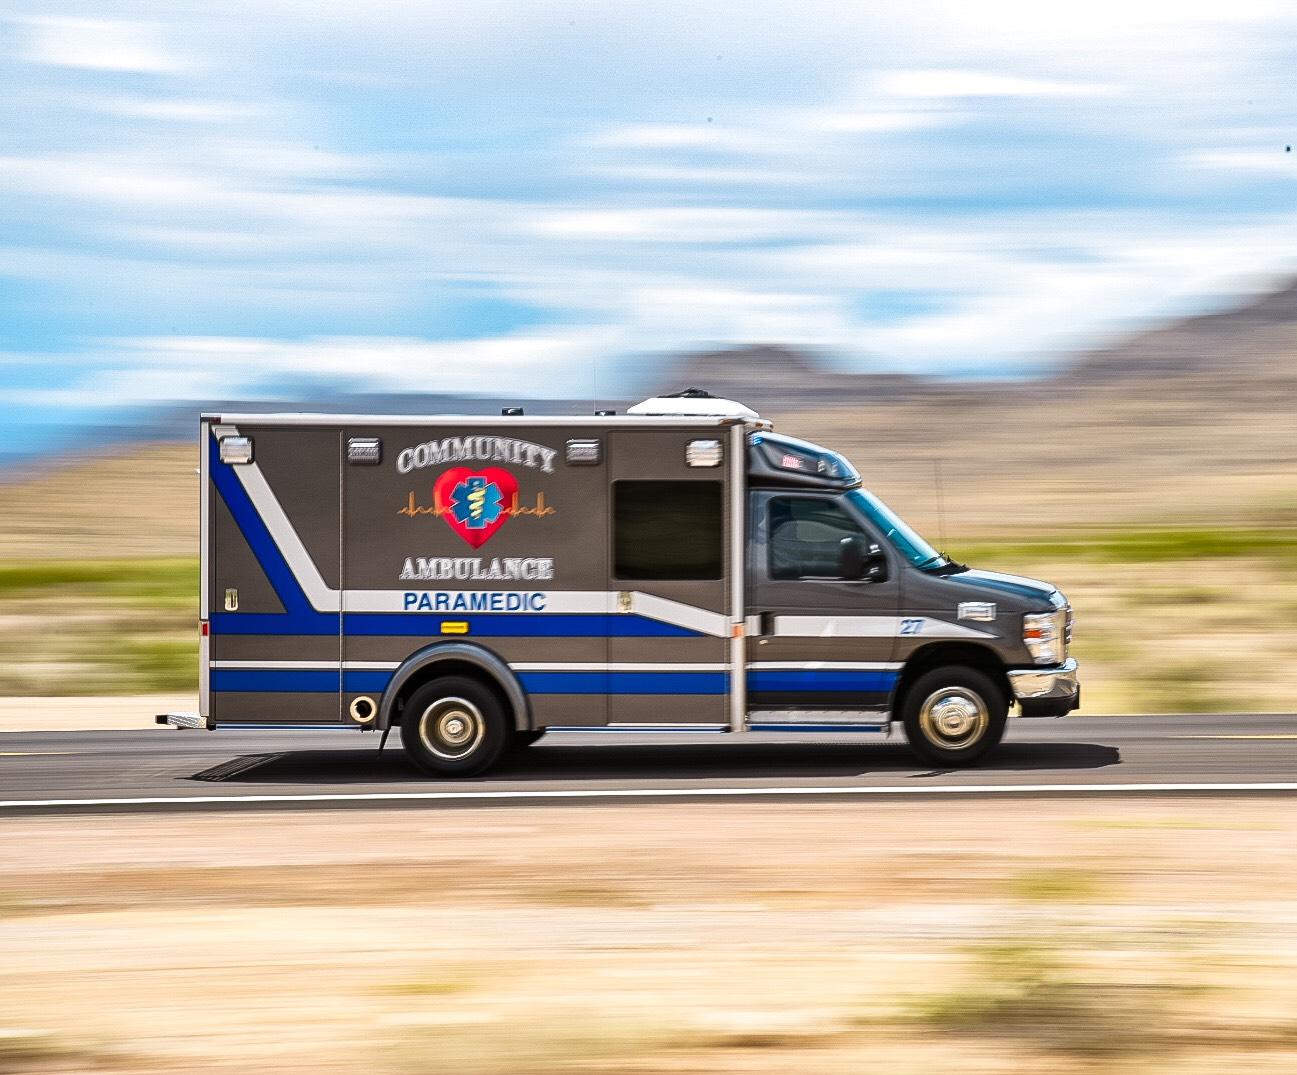 Community Ambulance - Demers MX151 Ambulances